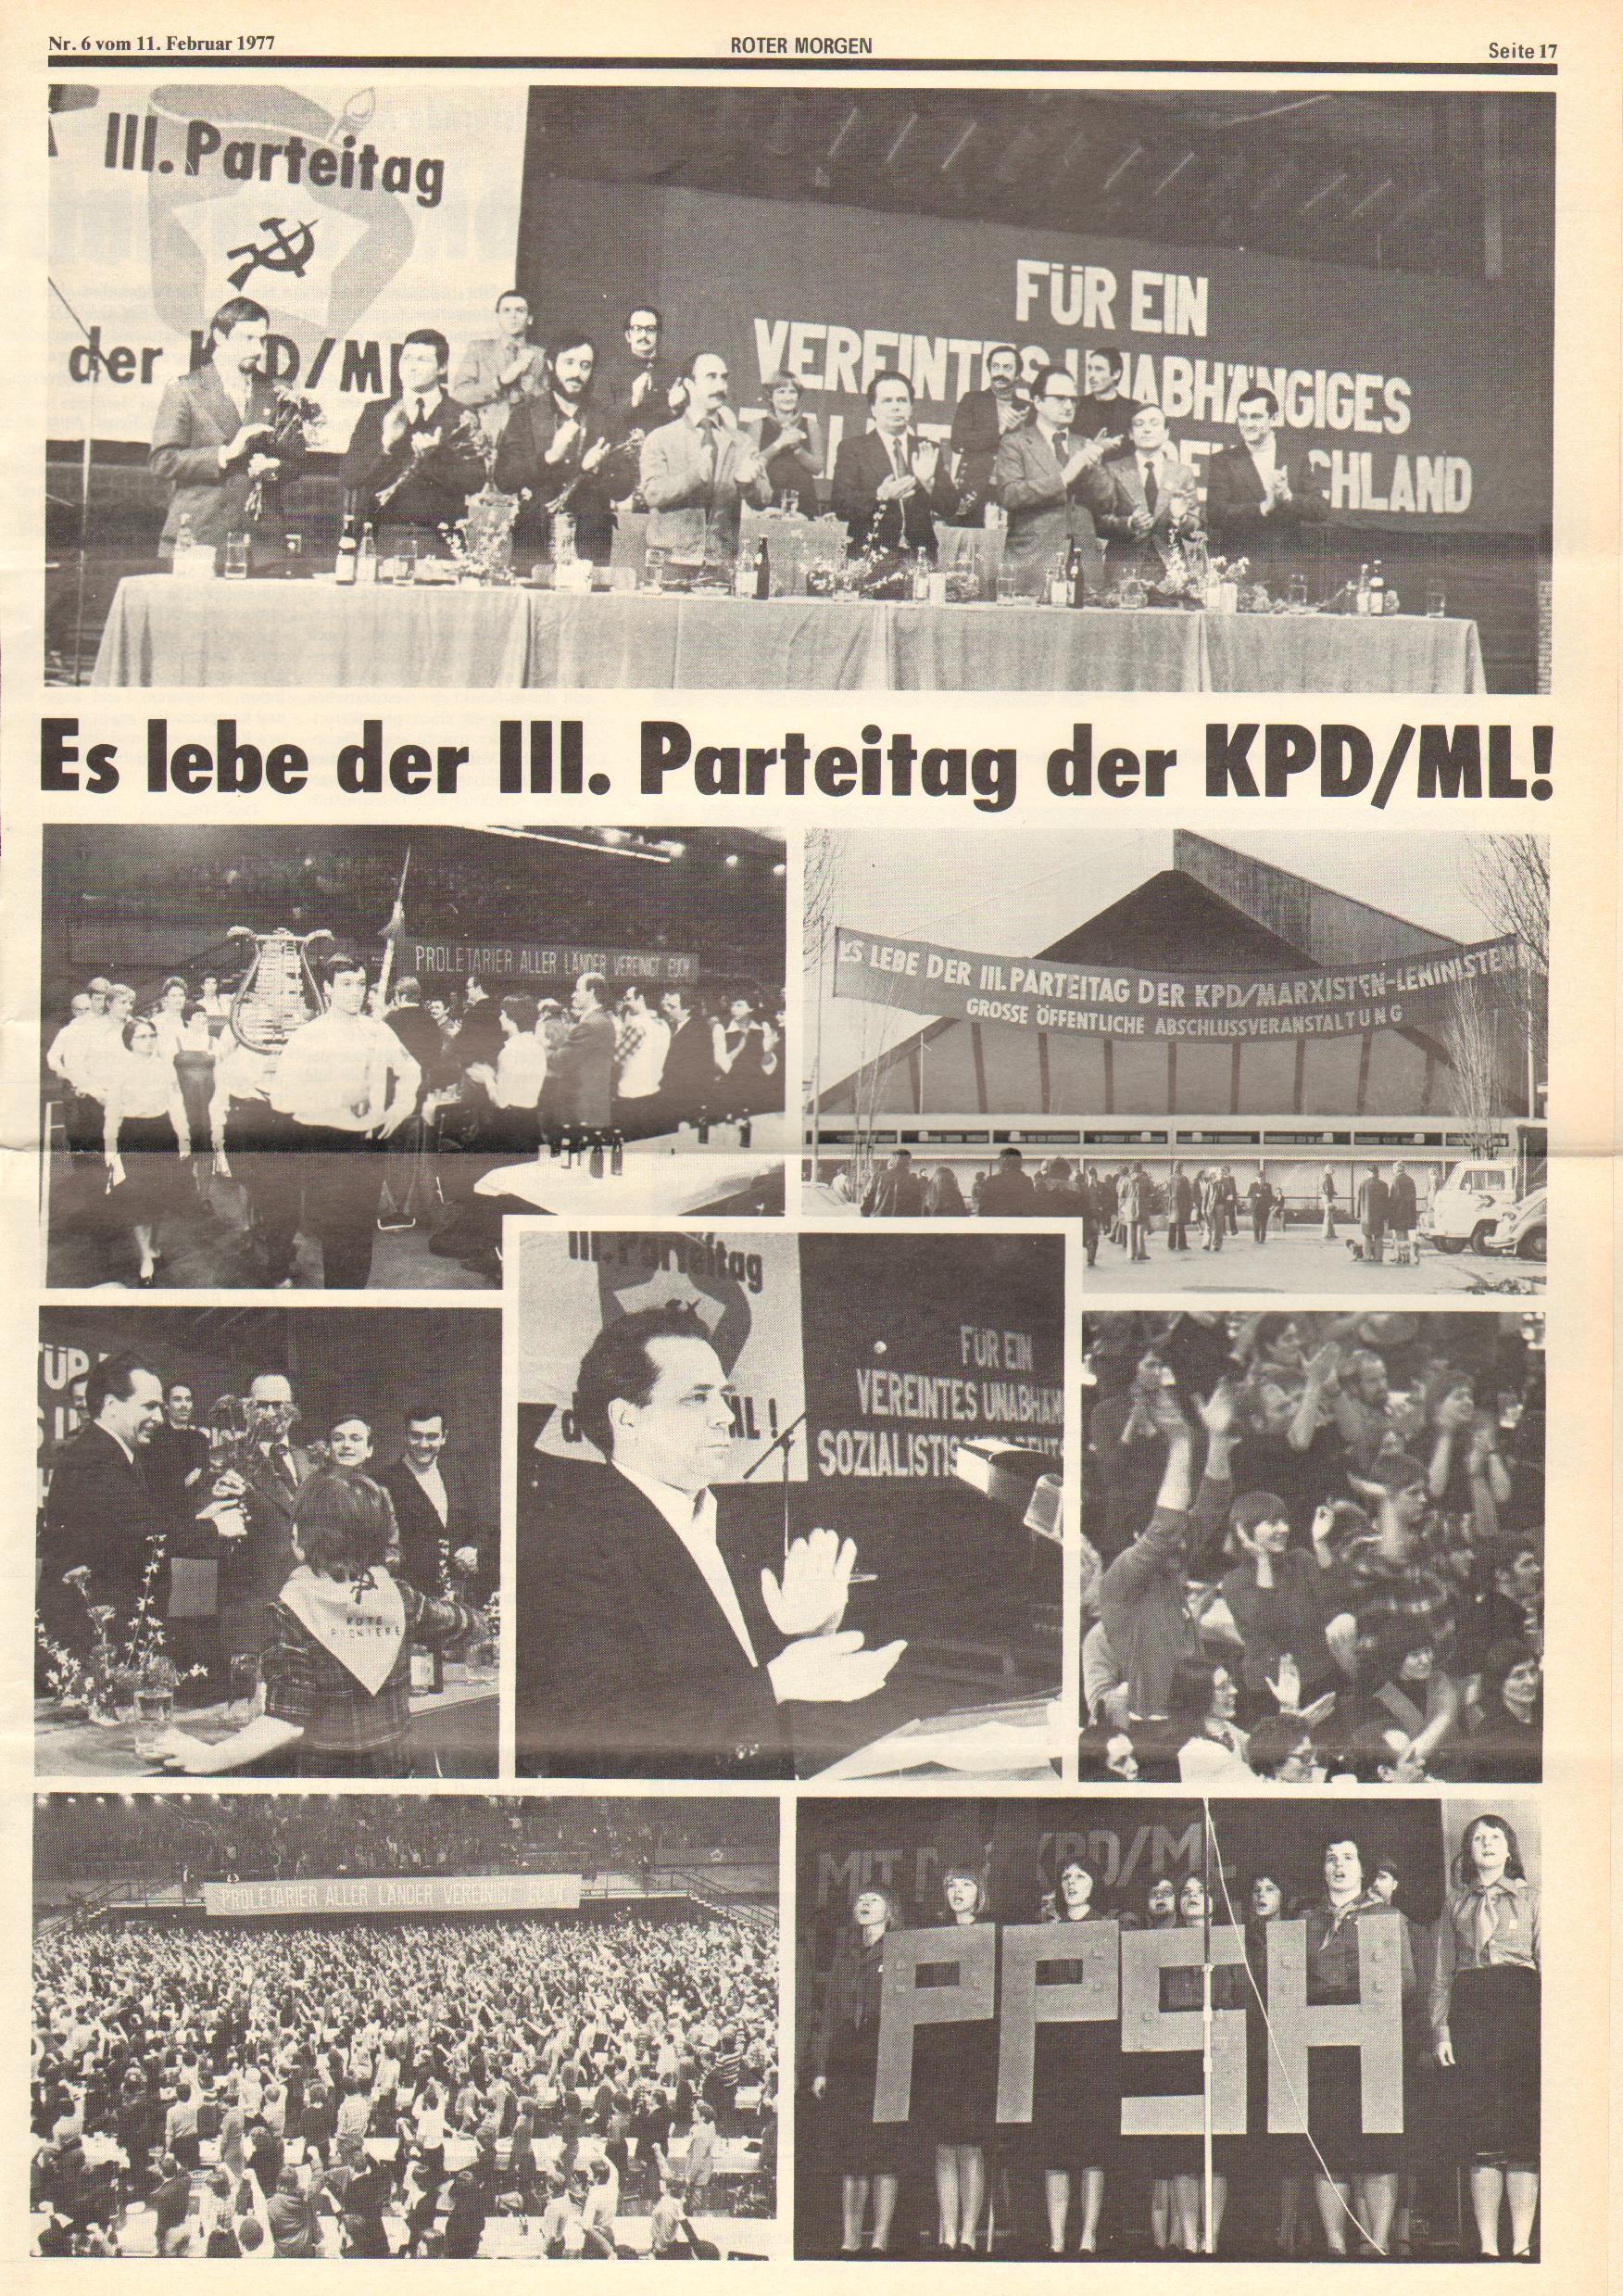 Roter Morgen, 11. Jg., 11. Februar 1977, Nr. 6, Seite 17